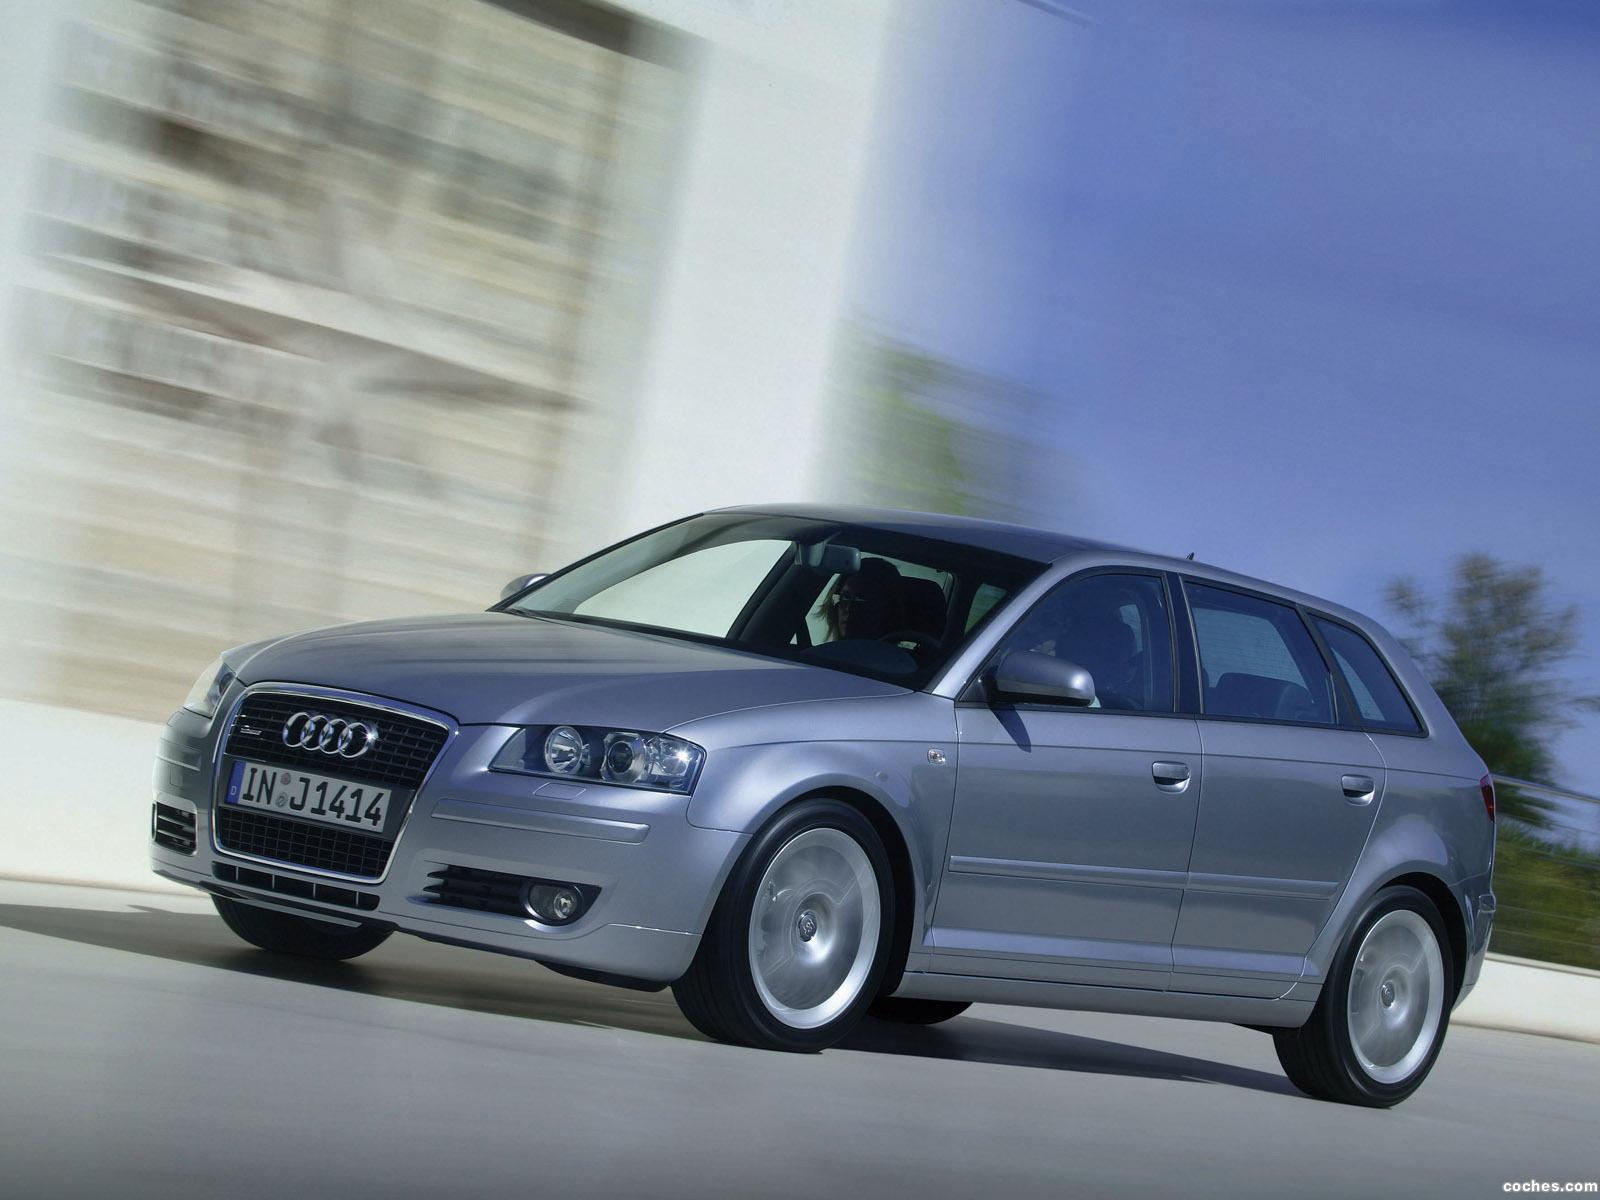 Foto 2 de Audi A3 Sportback 2005